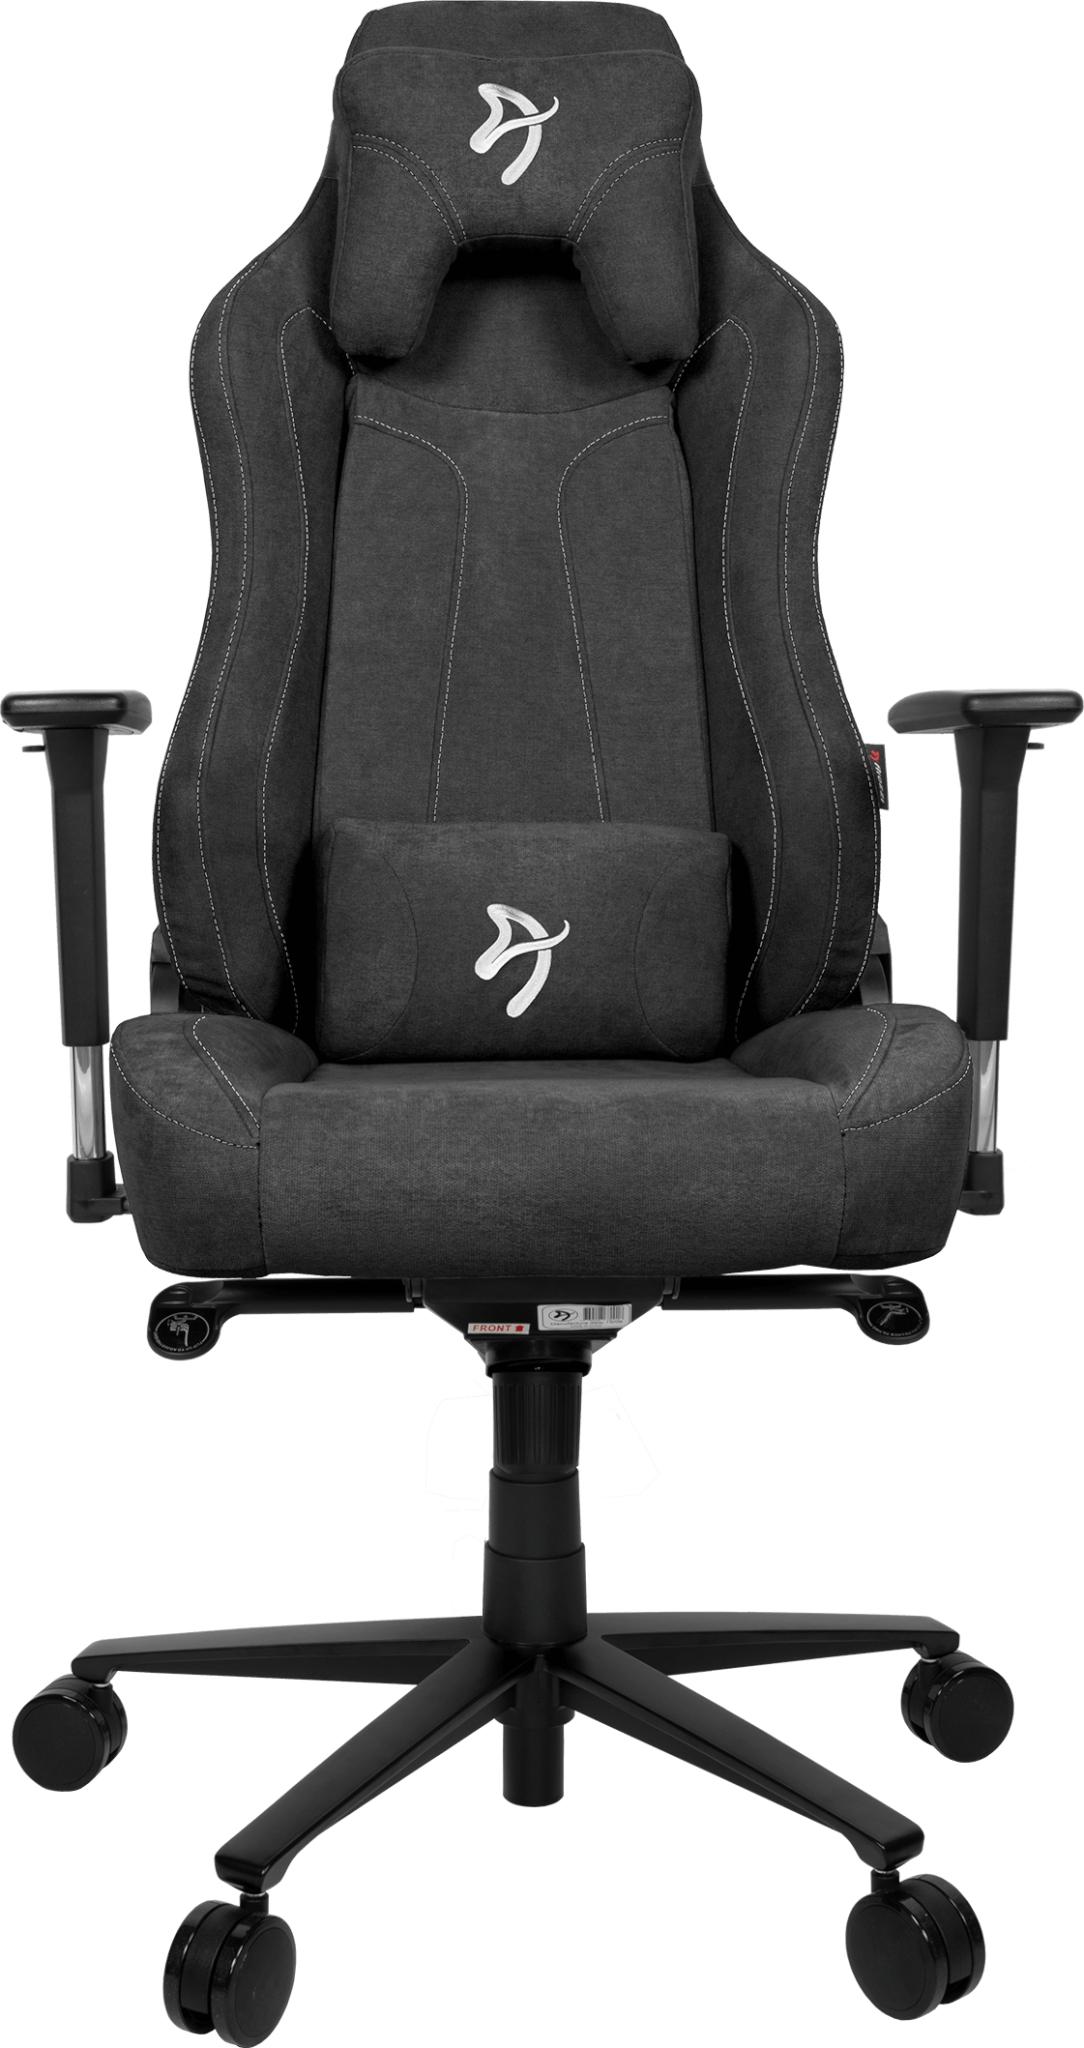 Arozzi Vernazza  - Universal-Gamingstuhl - Universal - 145 kg - Gepolsterter Sitz - Gepolsterte Rückenlehne - Schwarz